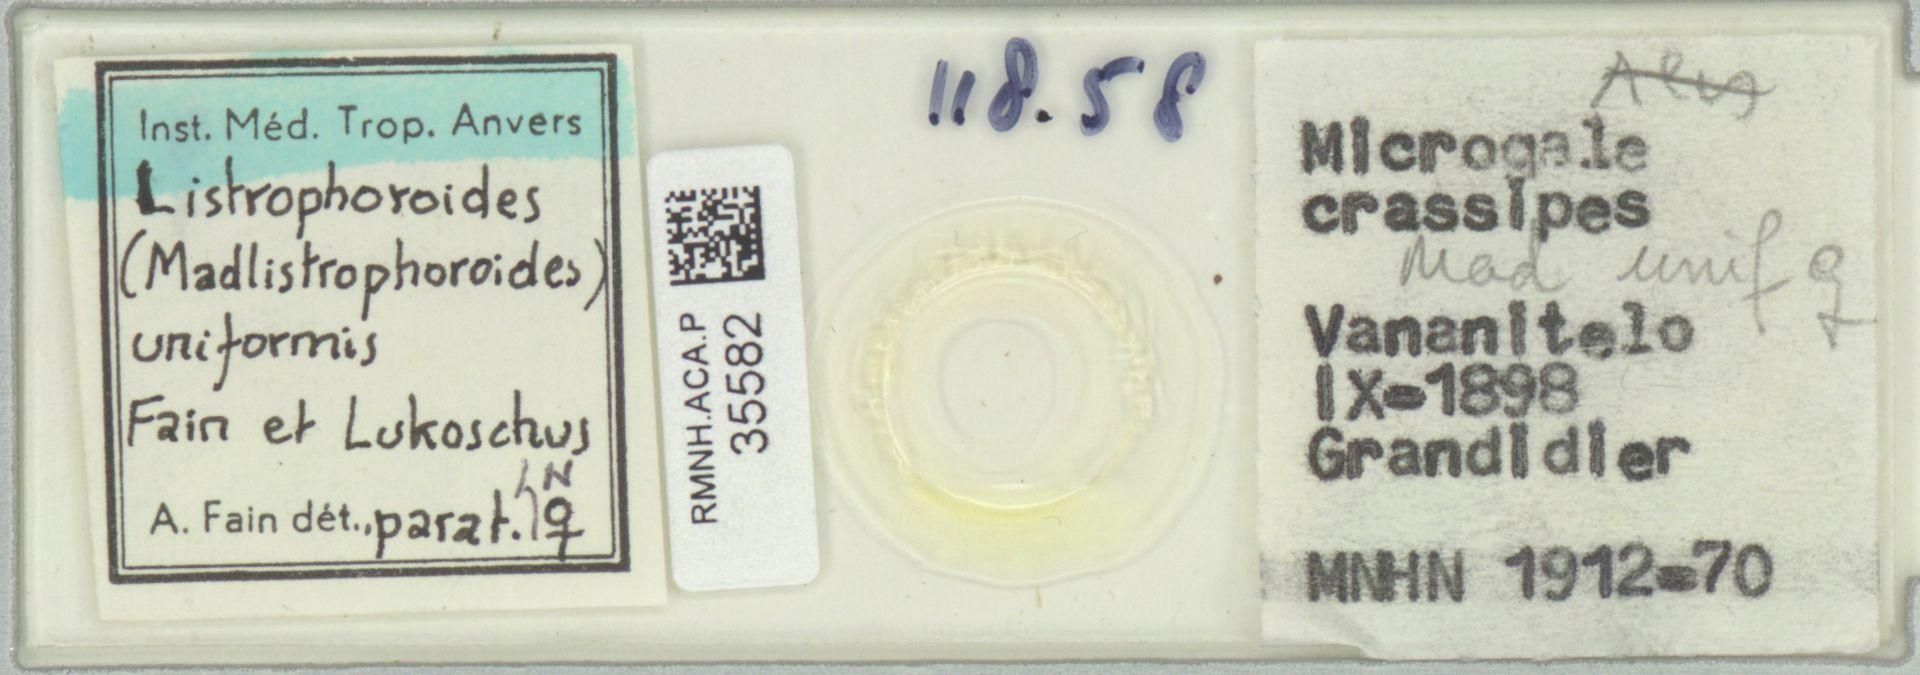 RMNH.ACA.P.35582 | Listrophoroides (Madlistrophoroides) uniformis Fain & Lukoschus